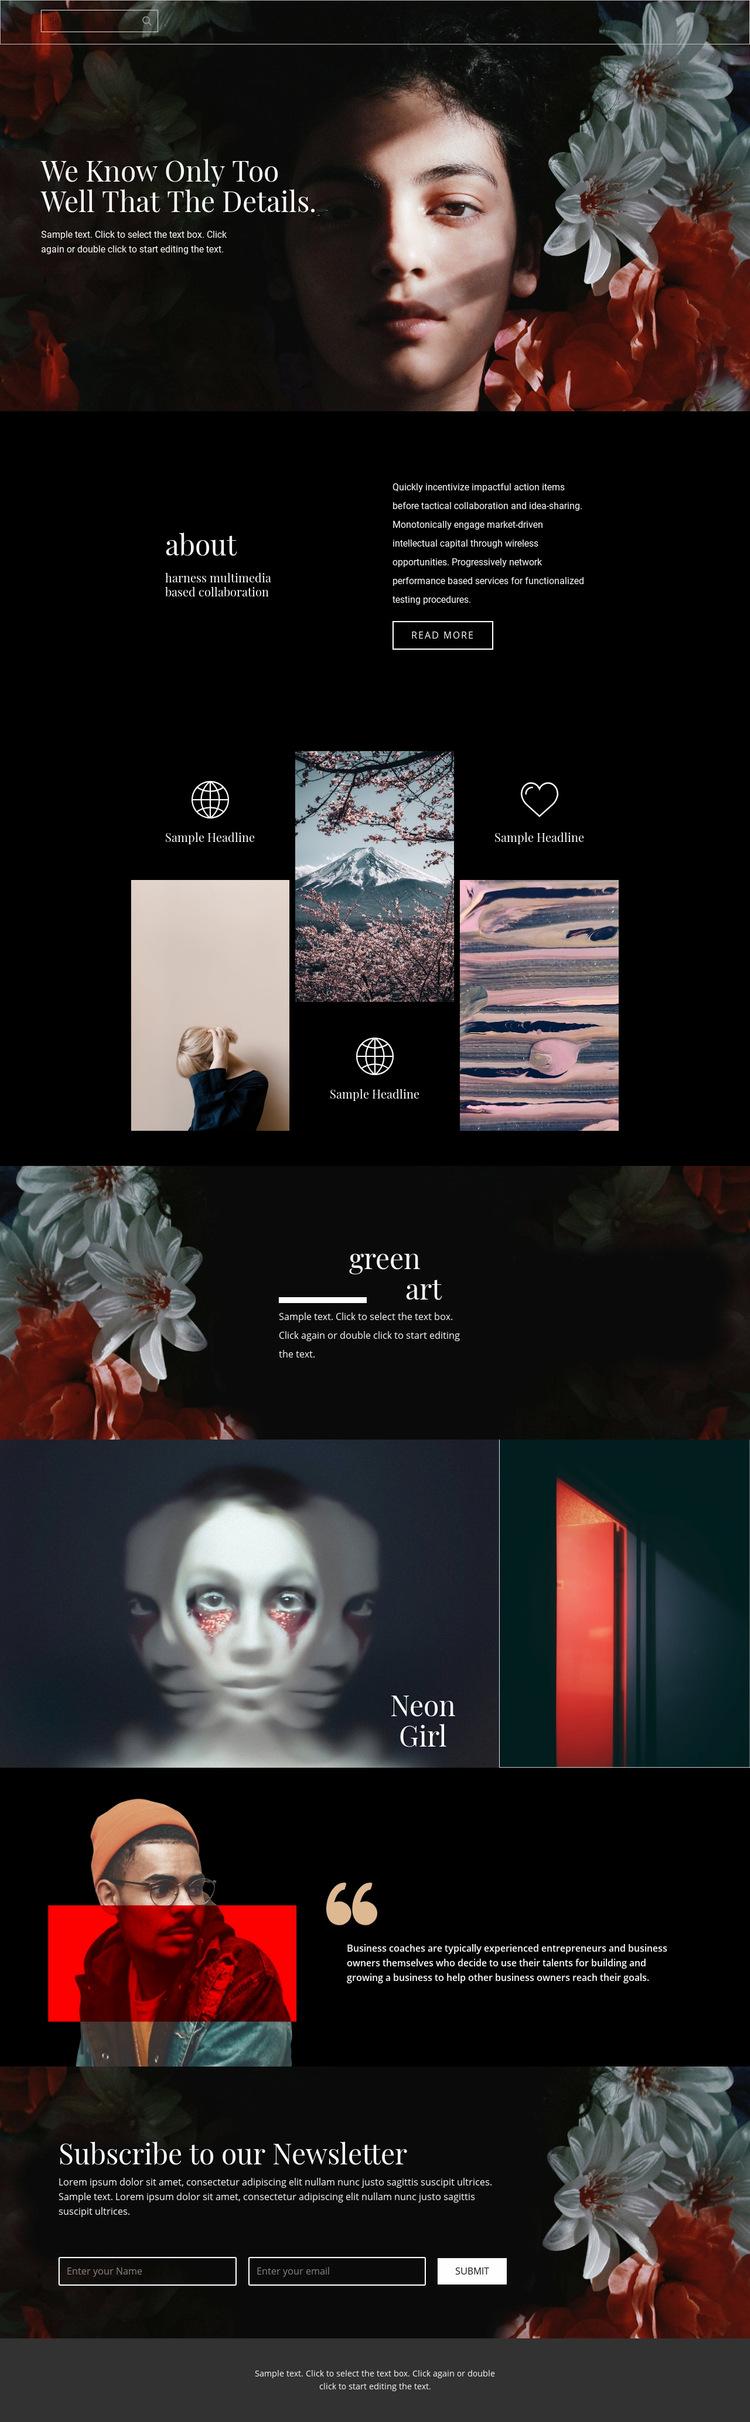 Important details of beauty Web Page Design